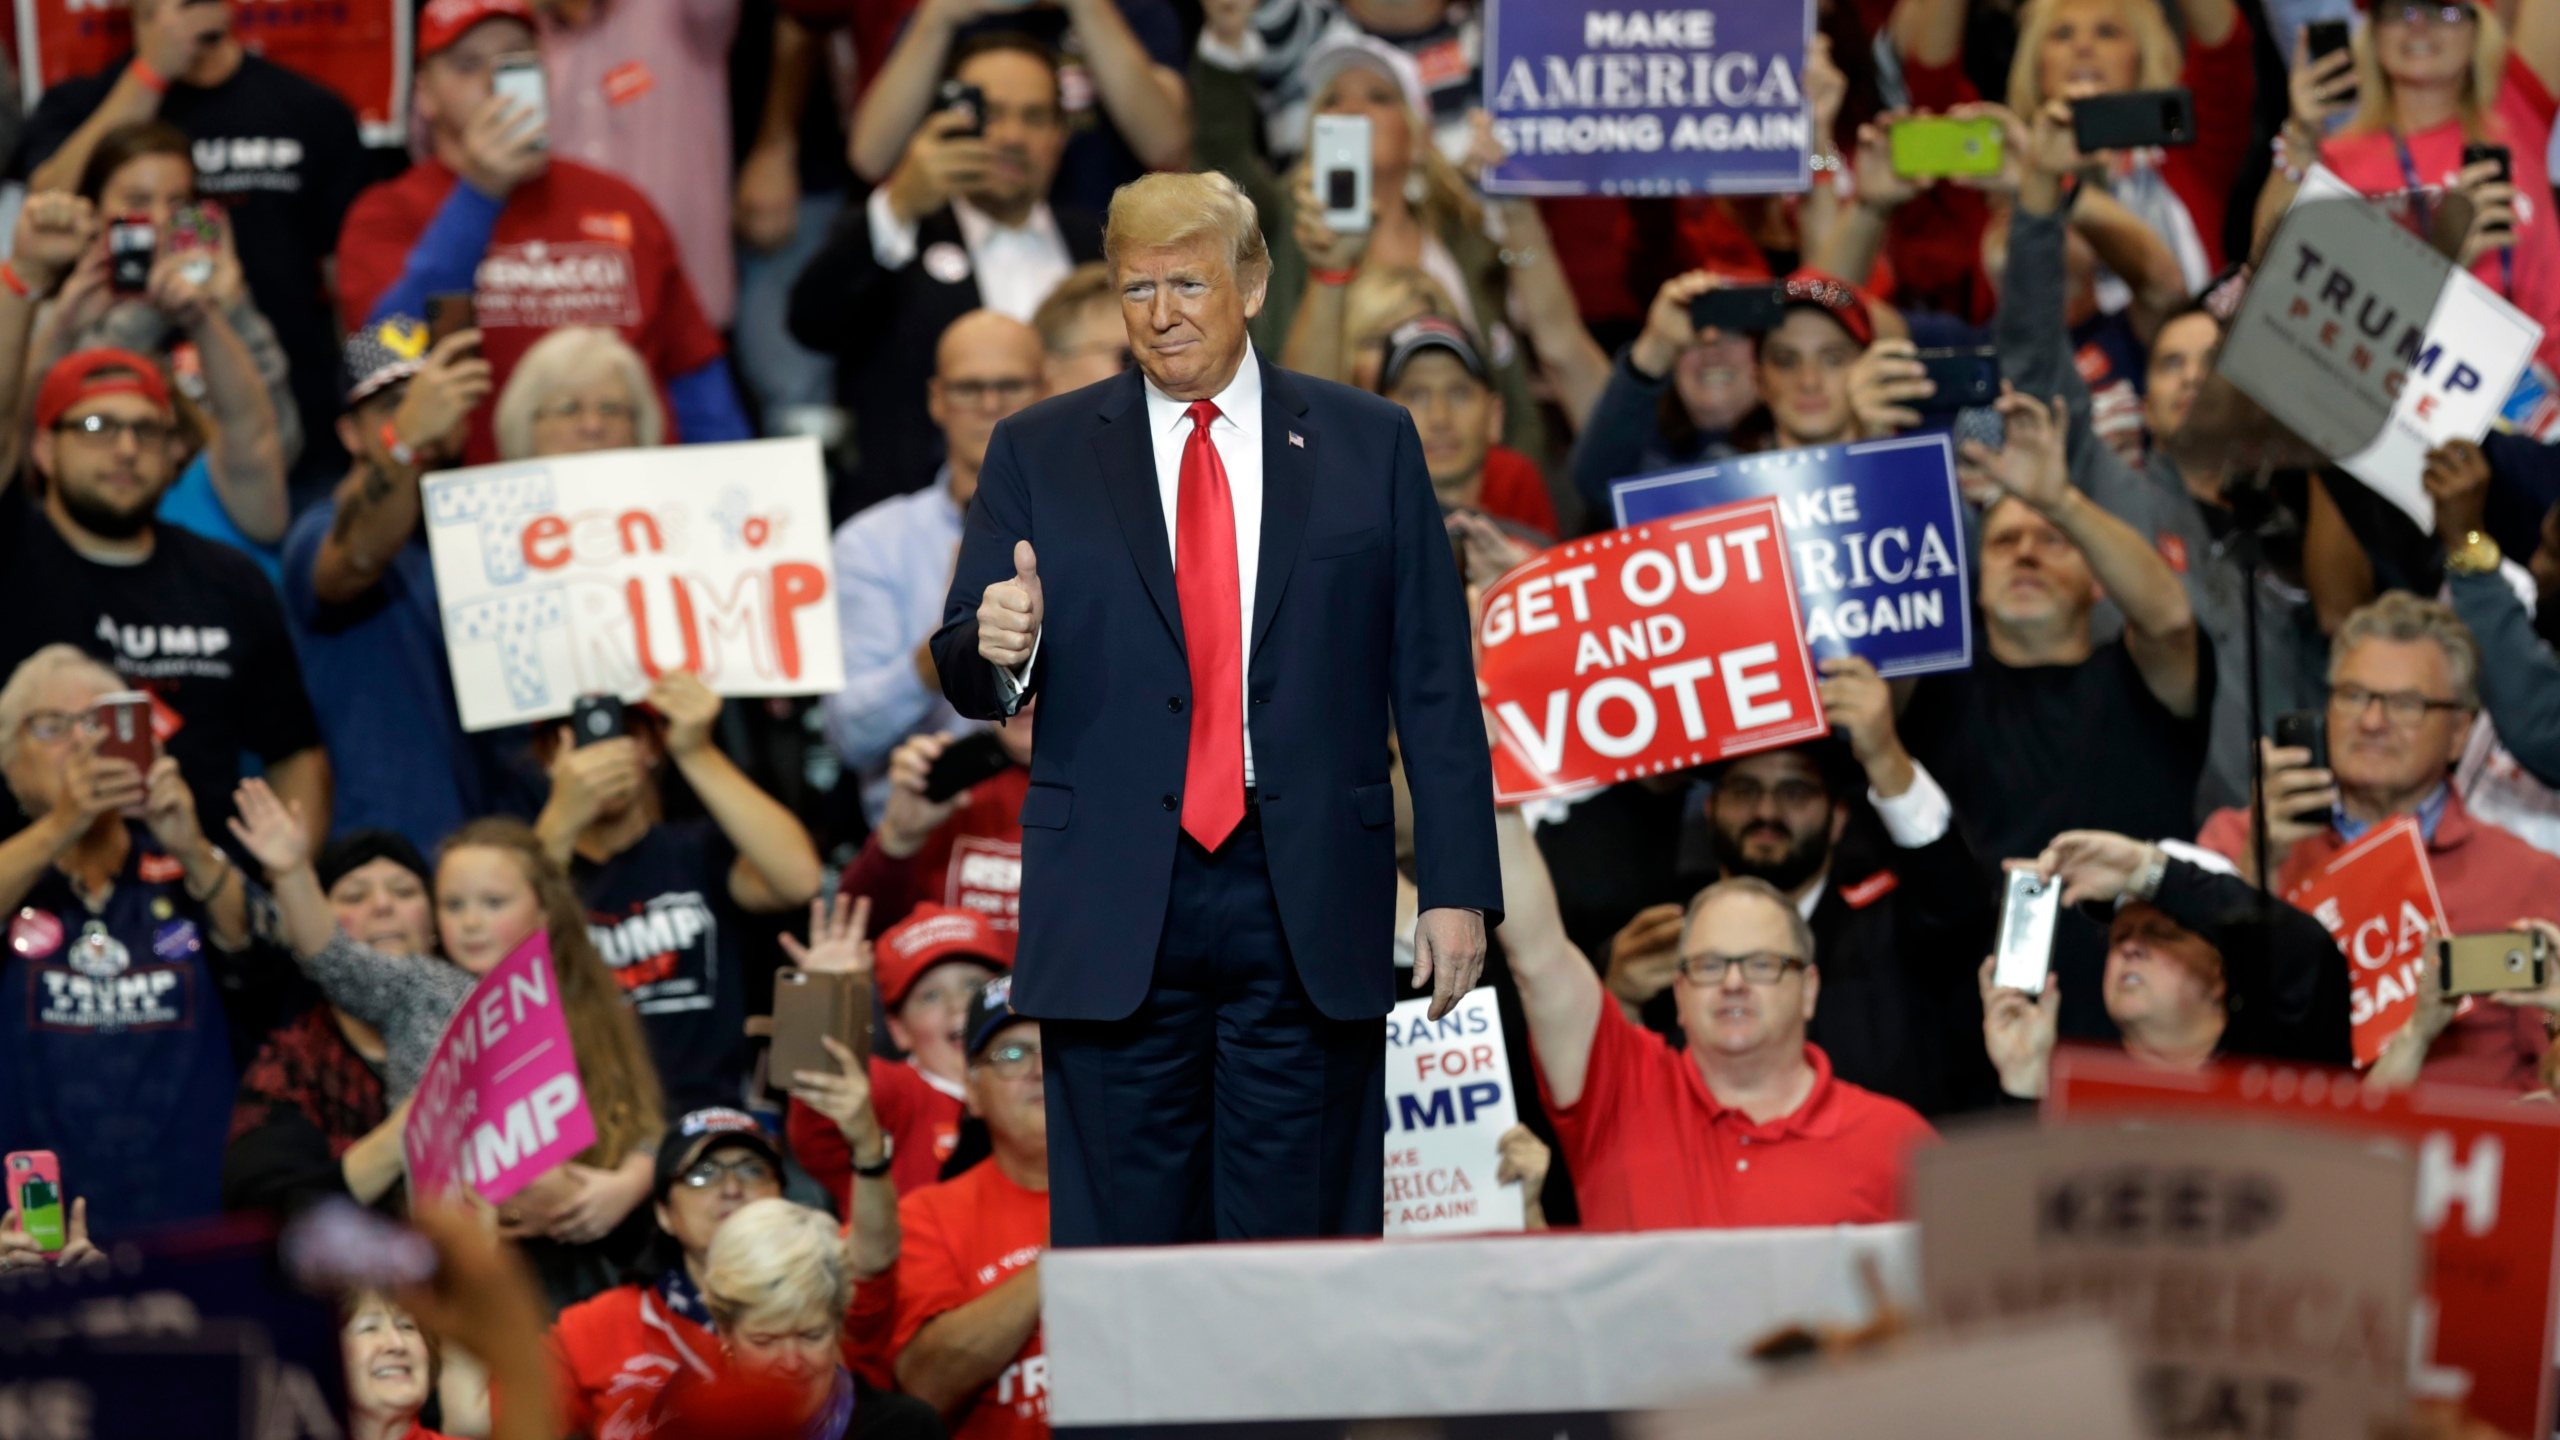 Election_2018_Trump_89025-159532.jpg05189684